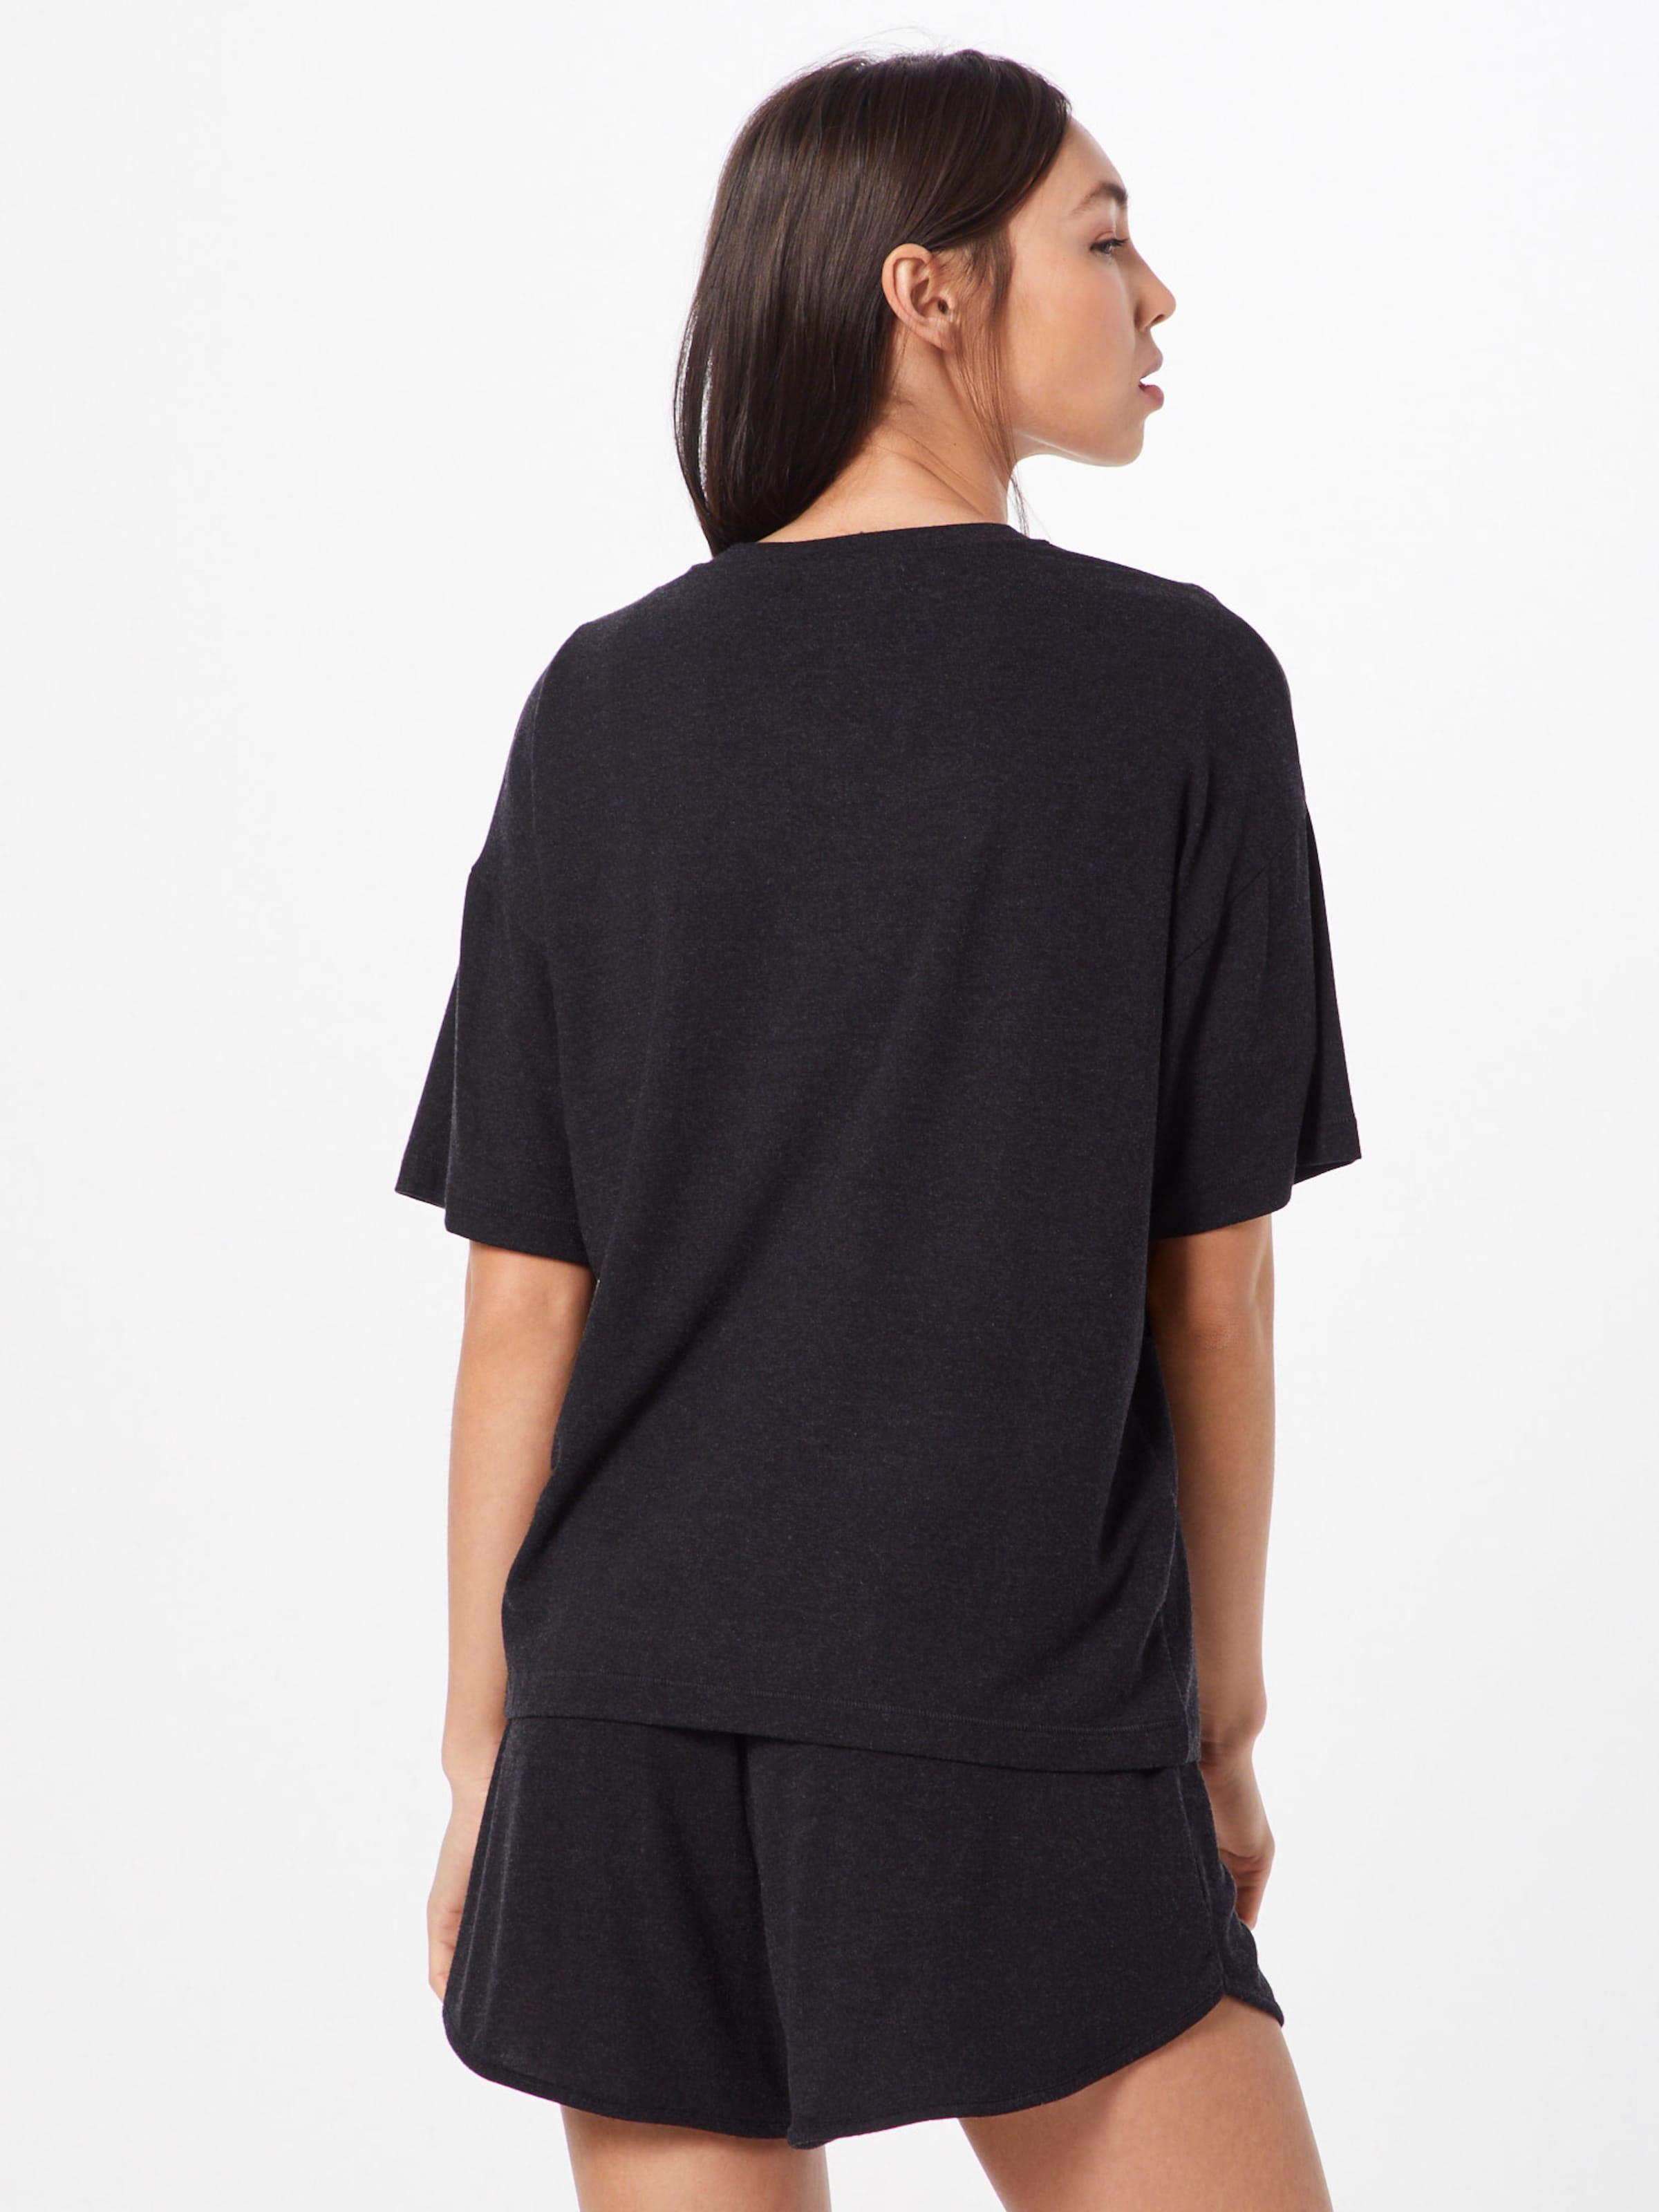 Copenhagen En Anthracite shirt Moss T qUMLjSpzGV